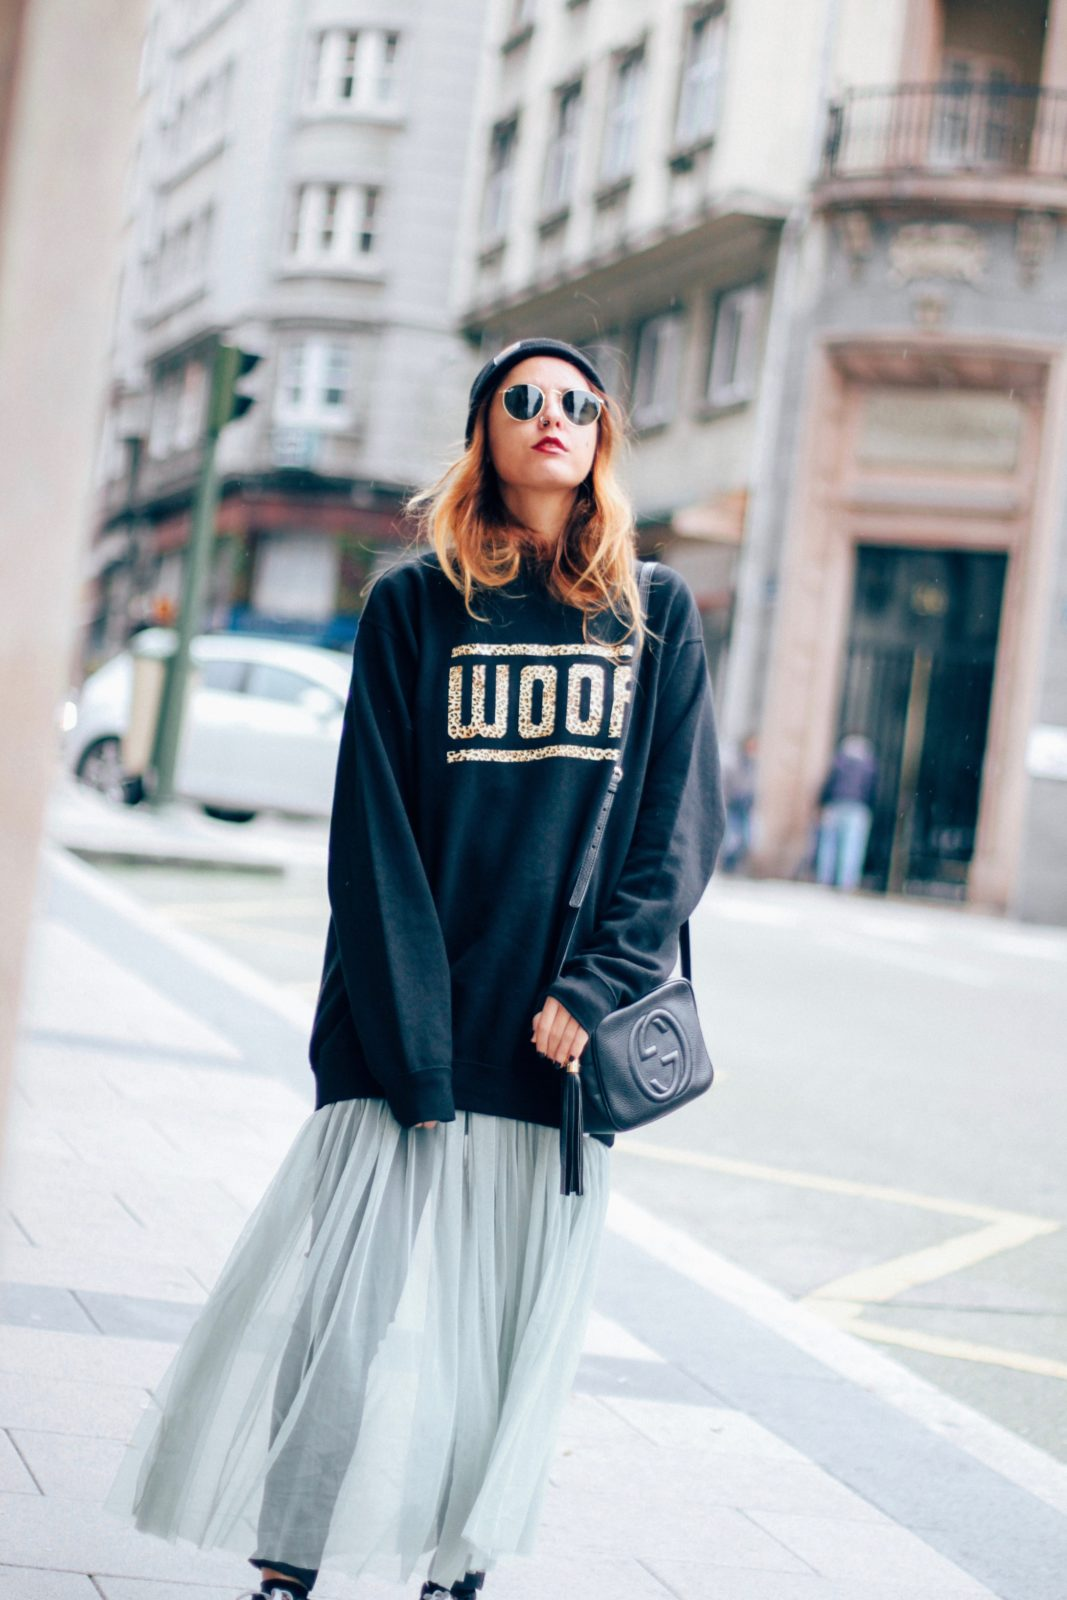 sudadera_old_dogs_falda_de_tul_vans_beanie_carhartt_look_donkeycool_street_style-10